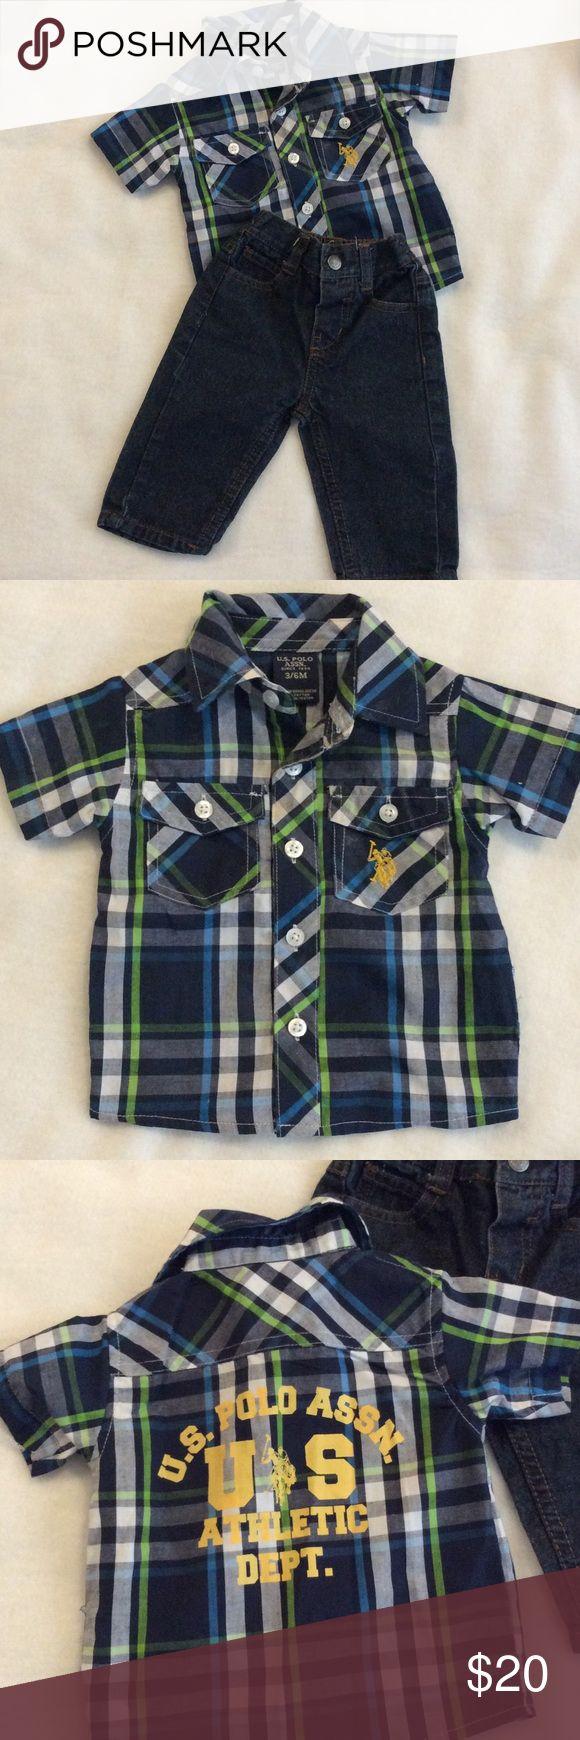 Cute Polo Boys Jeans & Shirt Outfit Shirt & Jeans Bundle. Excellent Condition. U.S. Polo ASSN Matching Sets